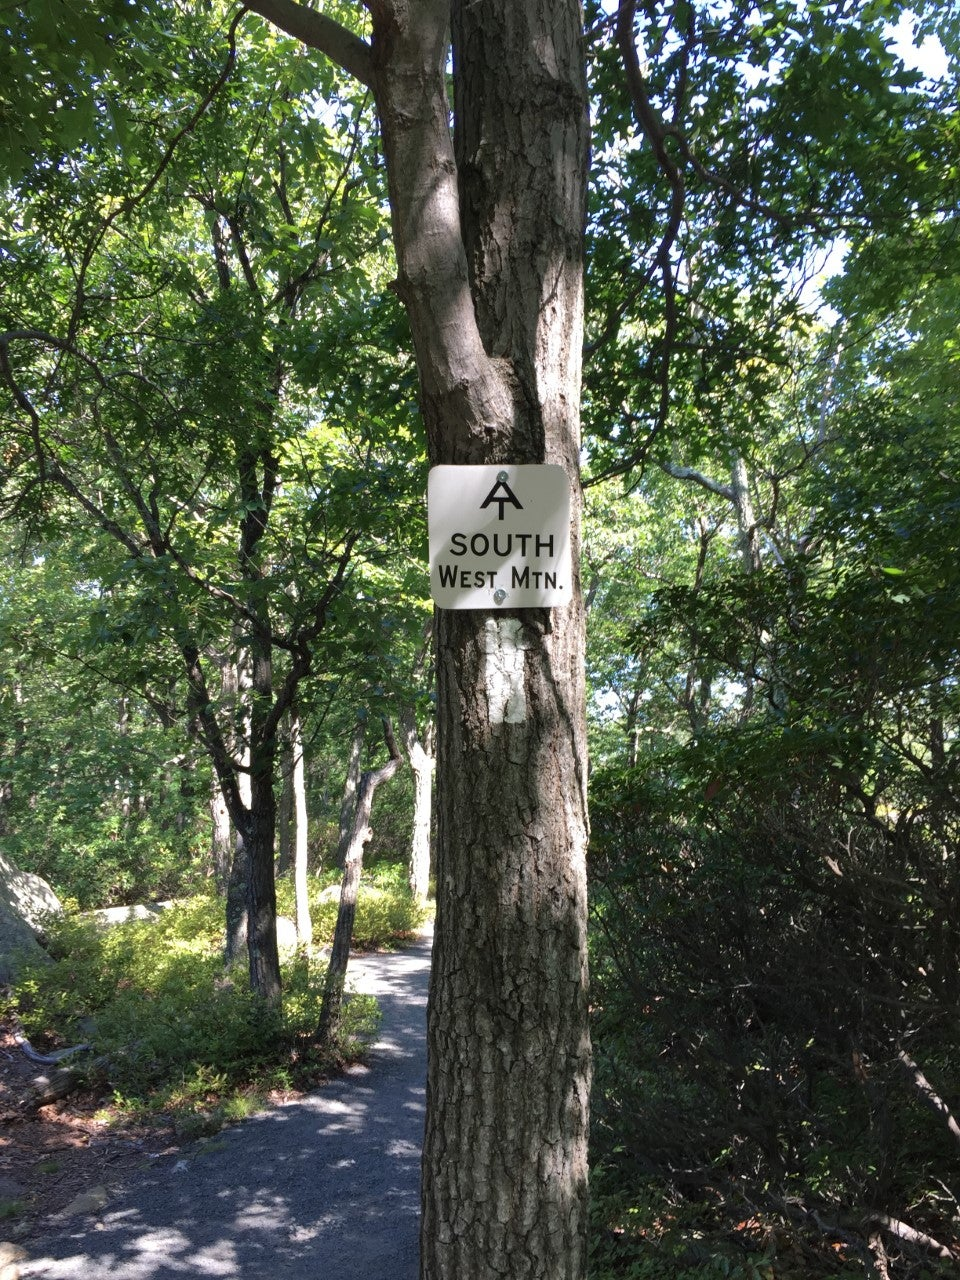 Appalachian Trail at Bear Mountain State Park (Photo: Brian Heyman, News 12)